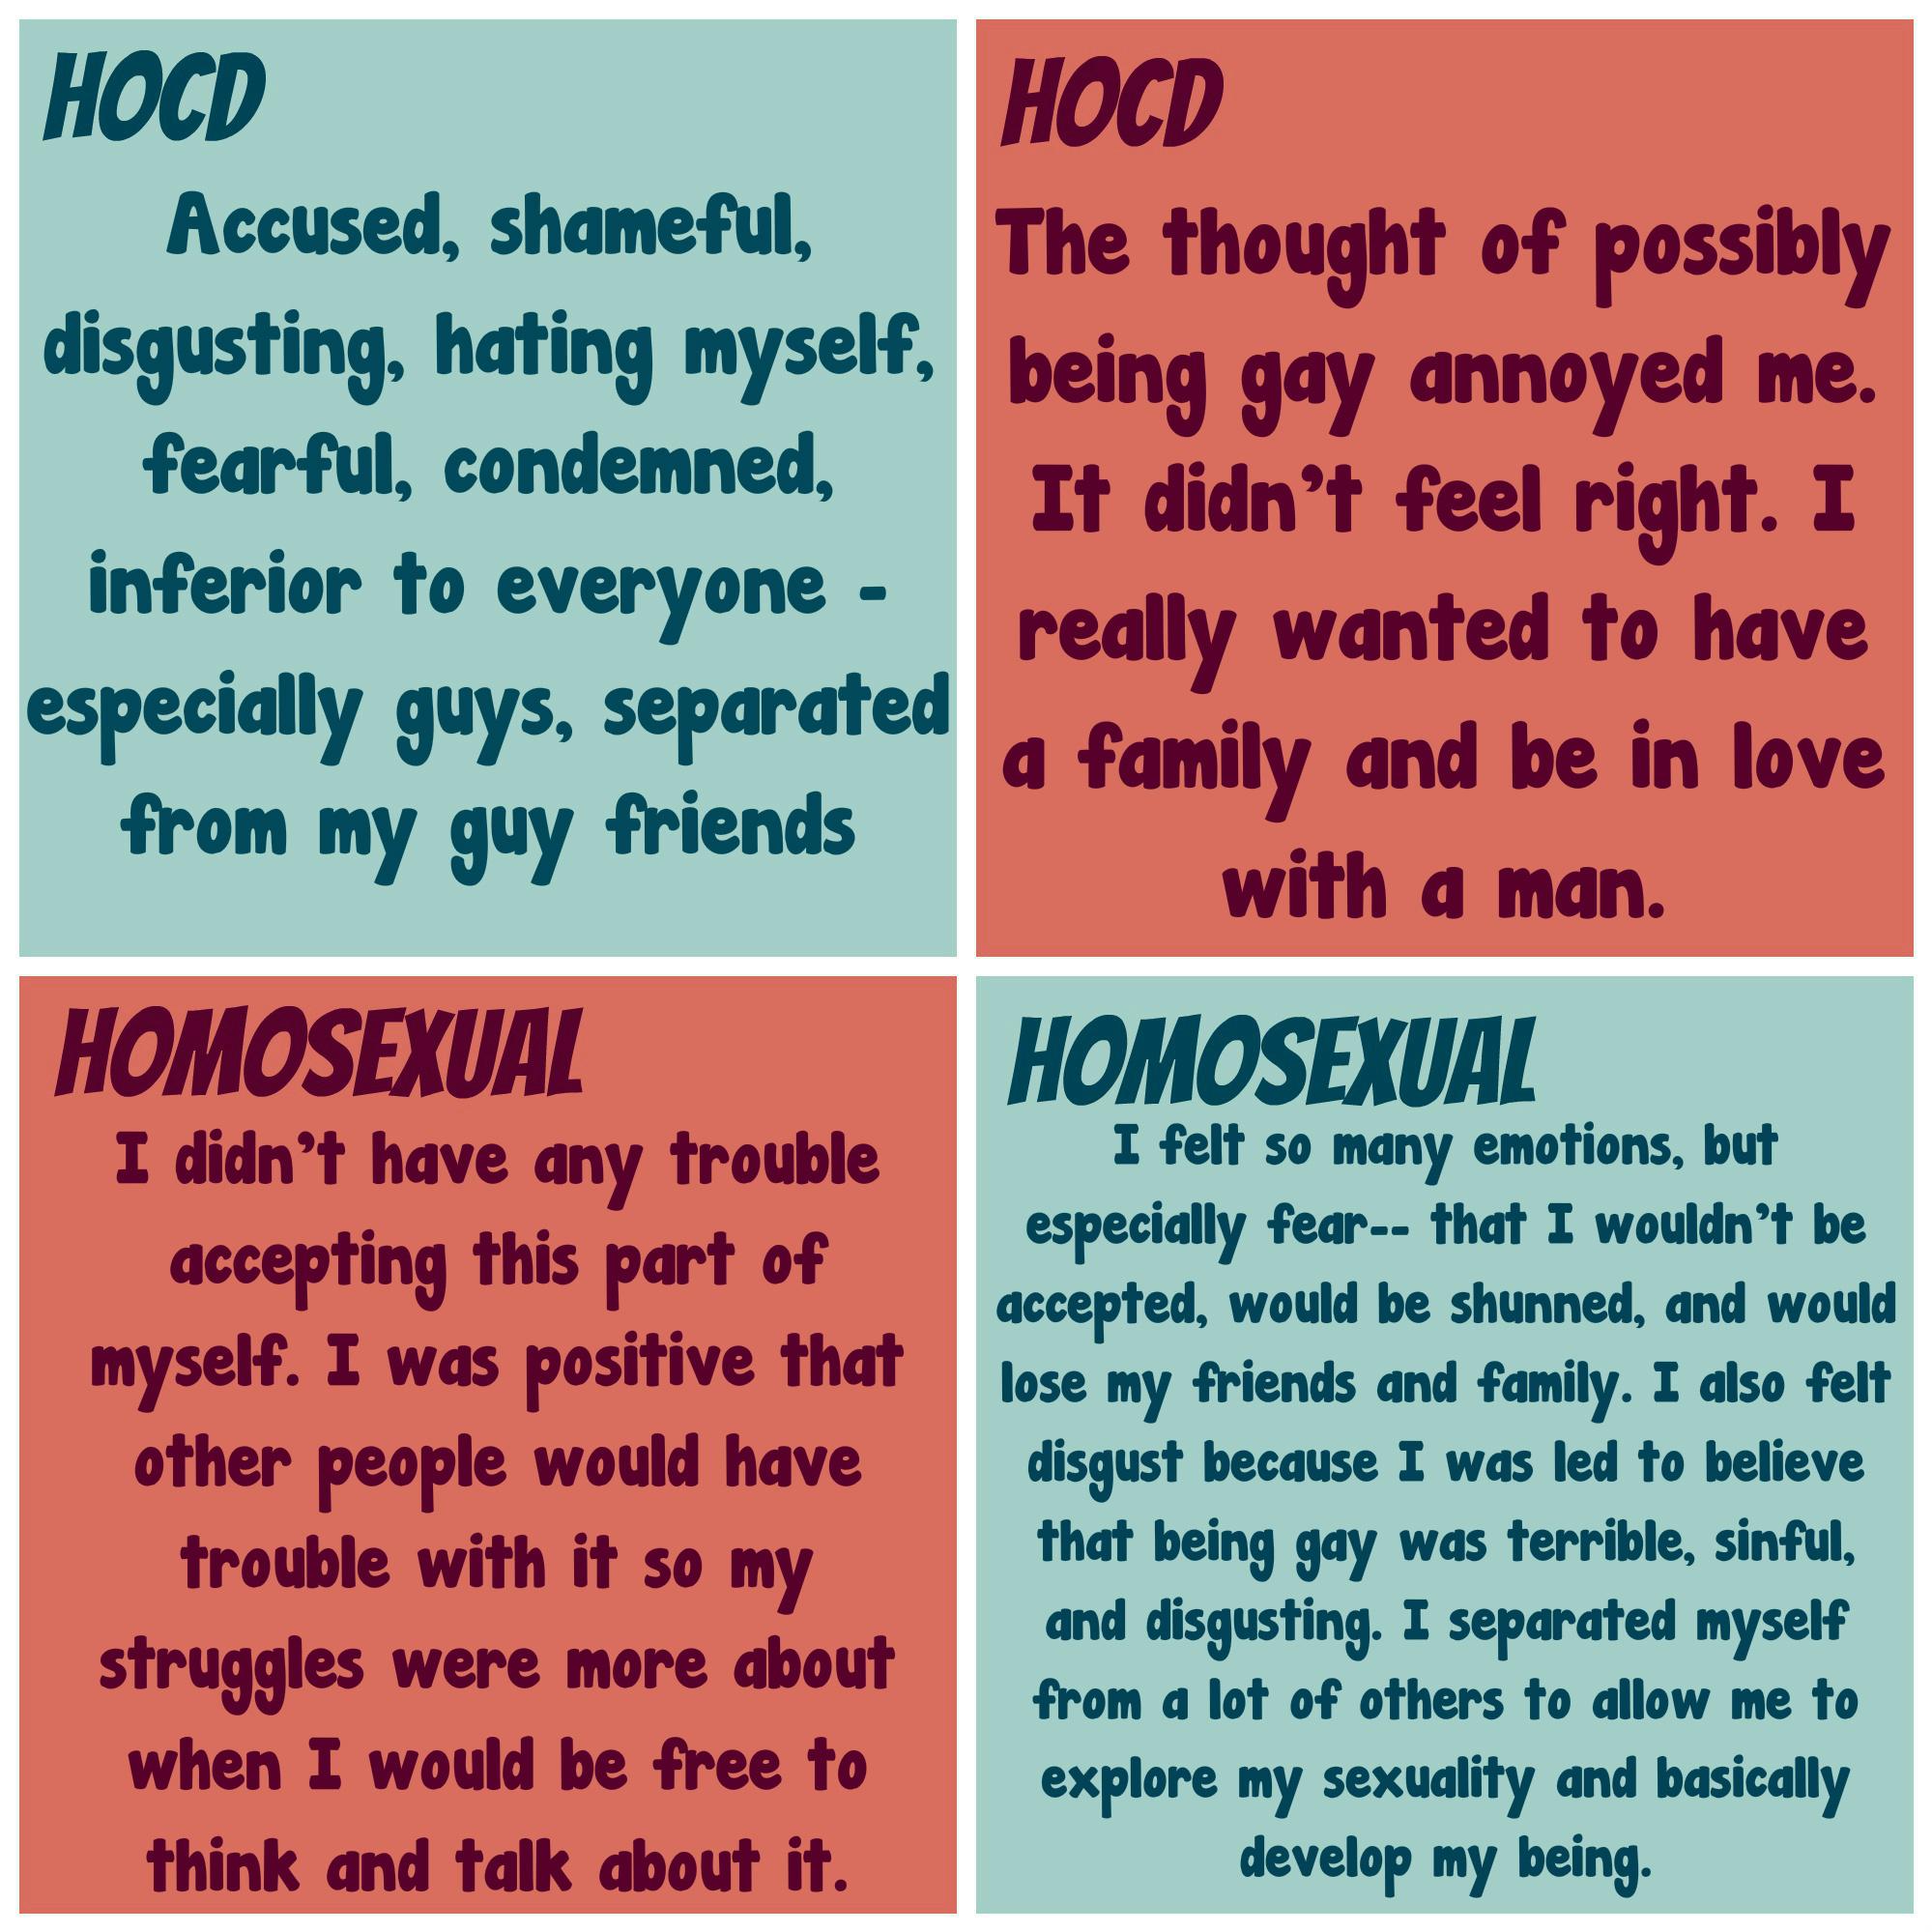 I am no longer homosexual relationship